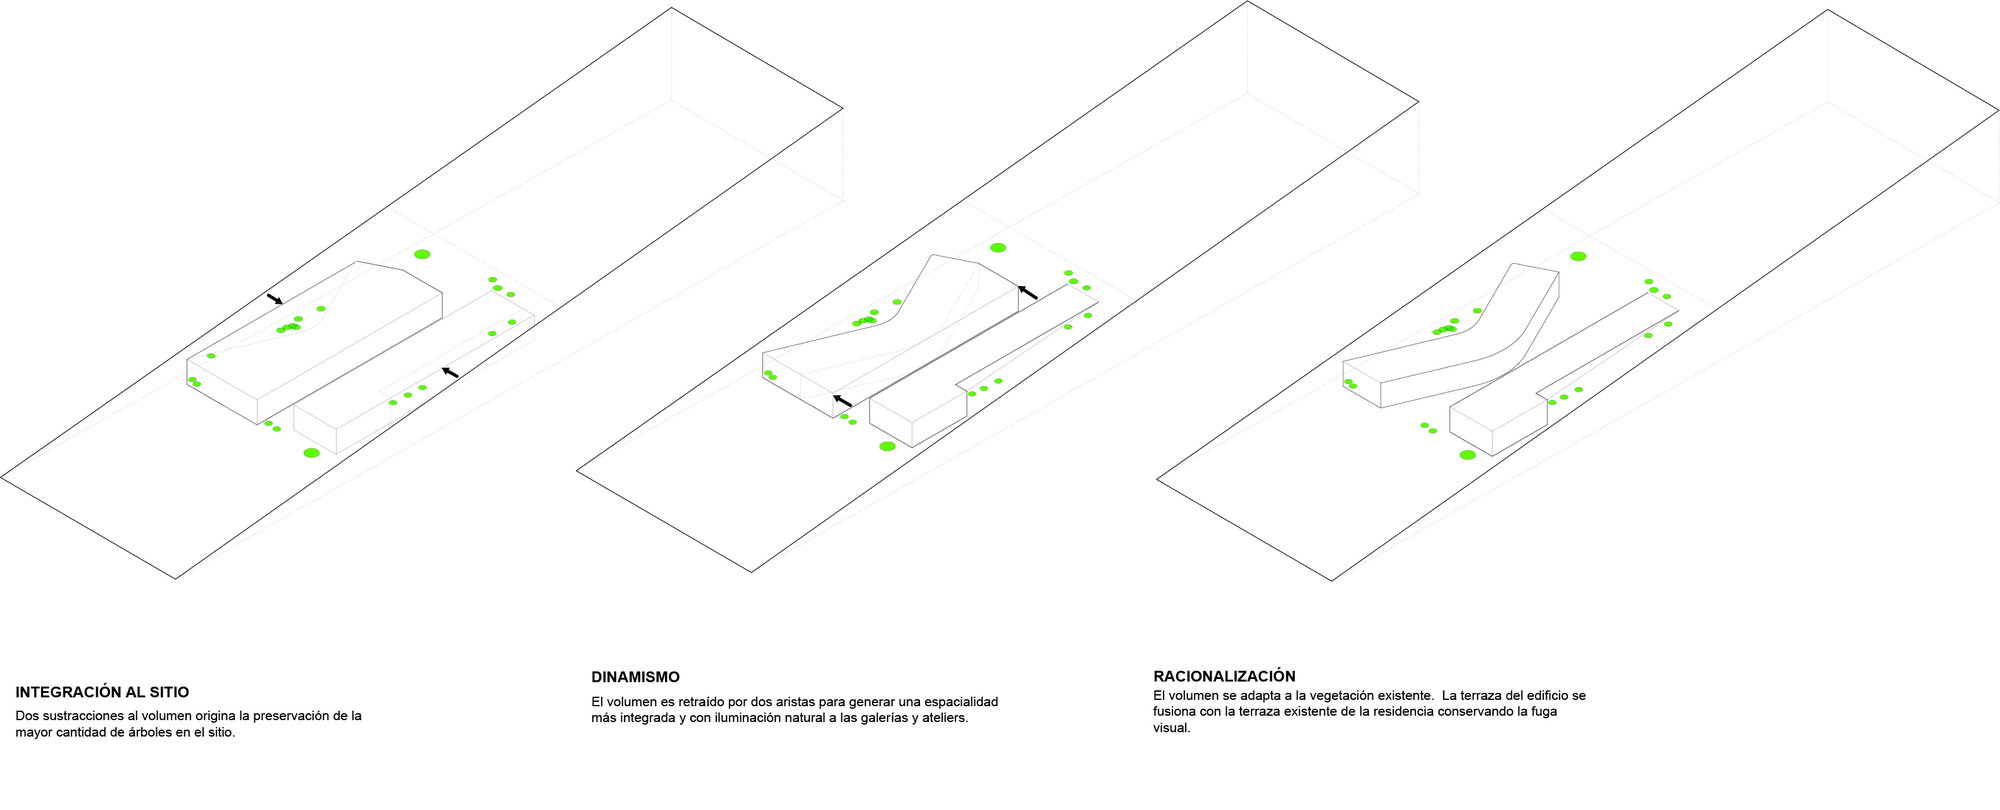 Diagrama. Image Courtesy of Wolfgang Schoenbeck